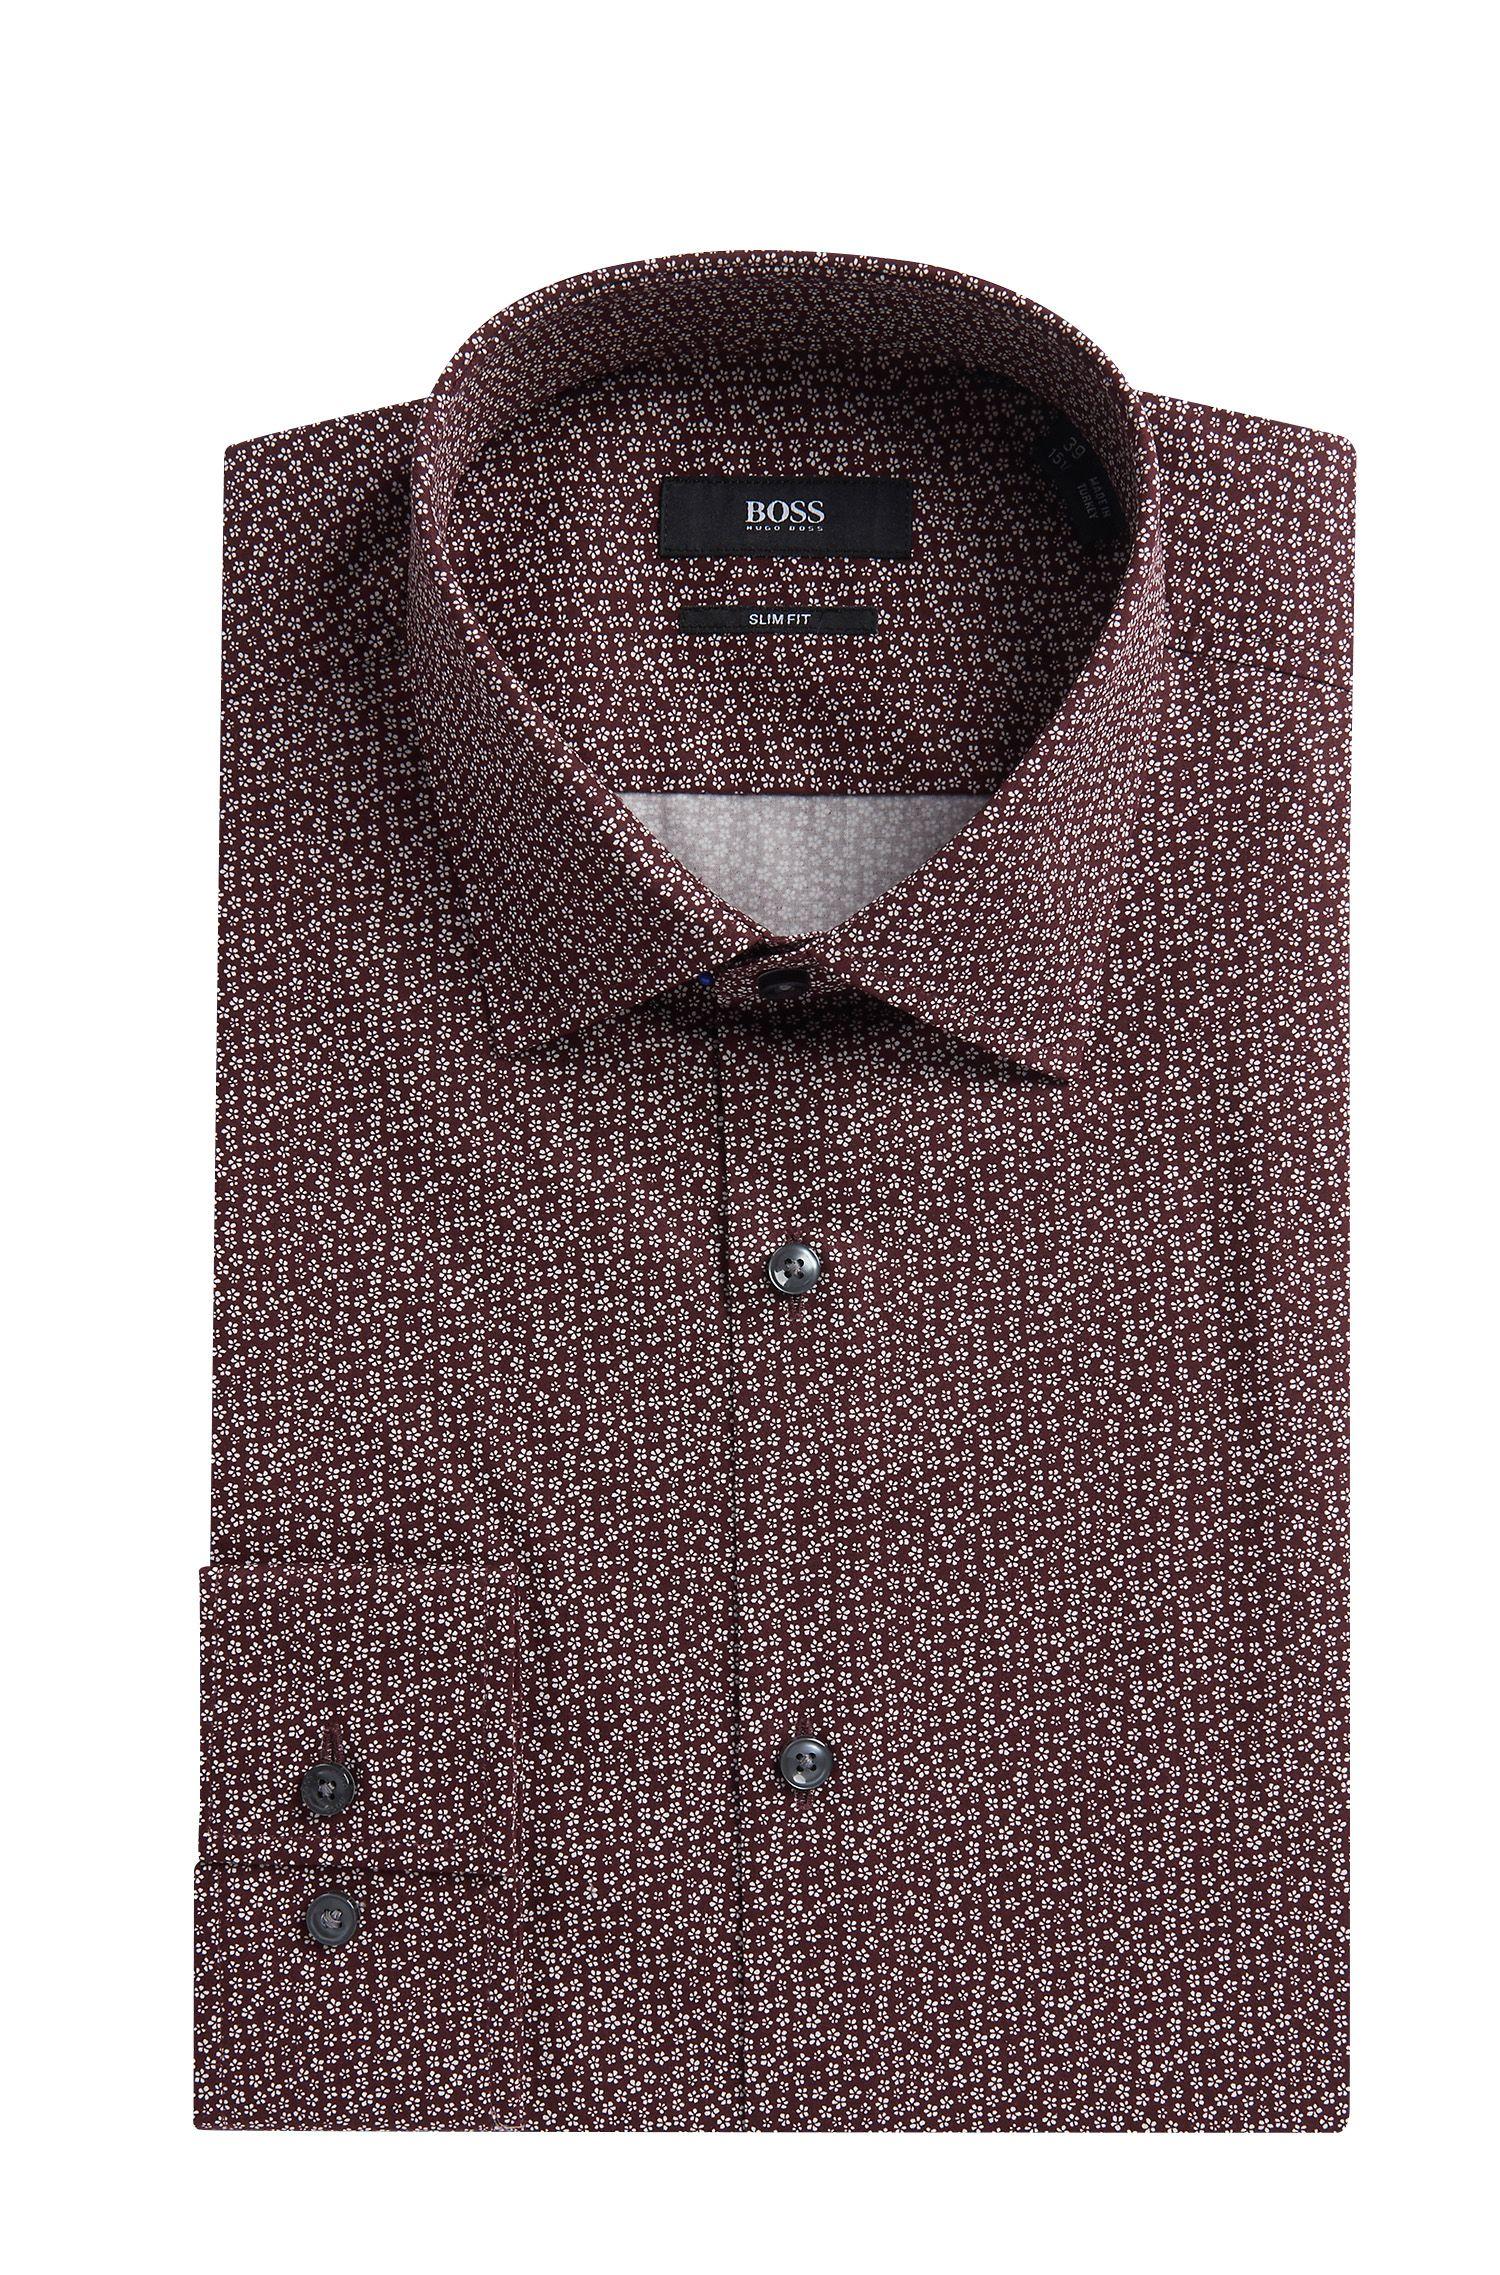 Flower-Print Cotton Dress Shirt, Slim Fit | Jenno, Dark Red